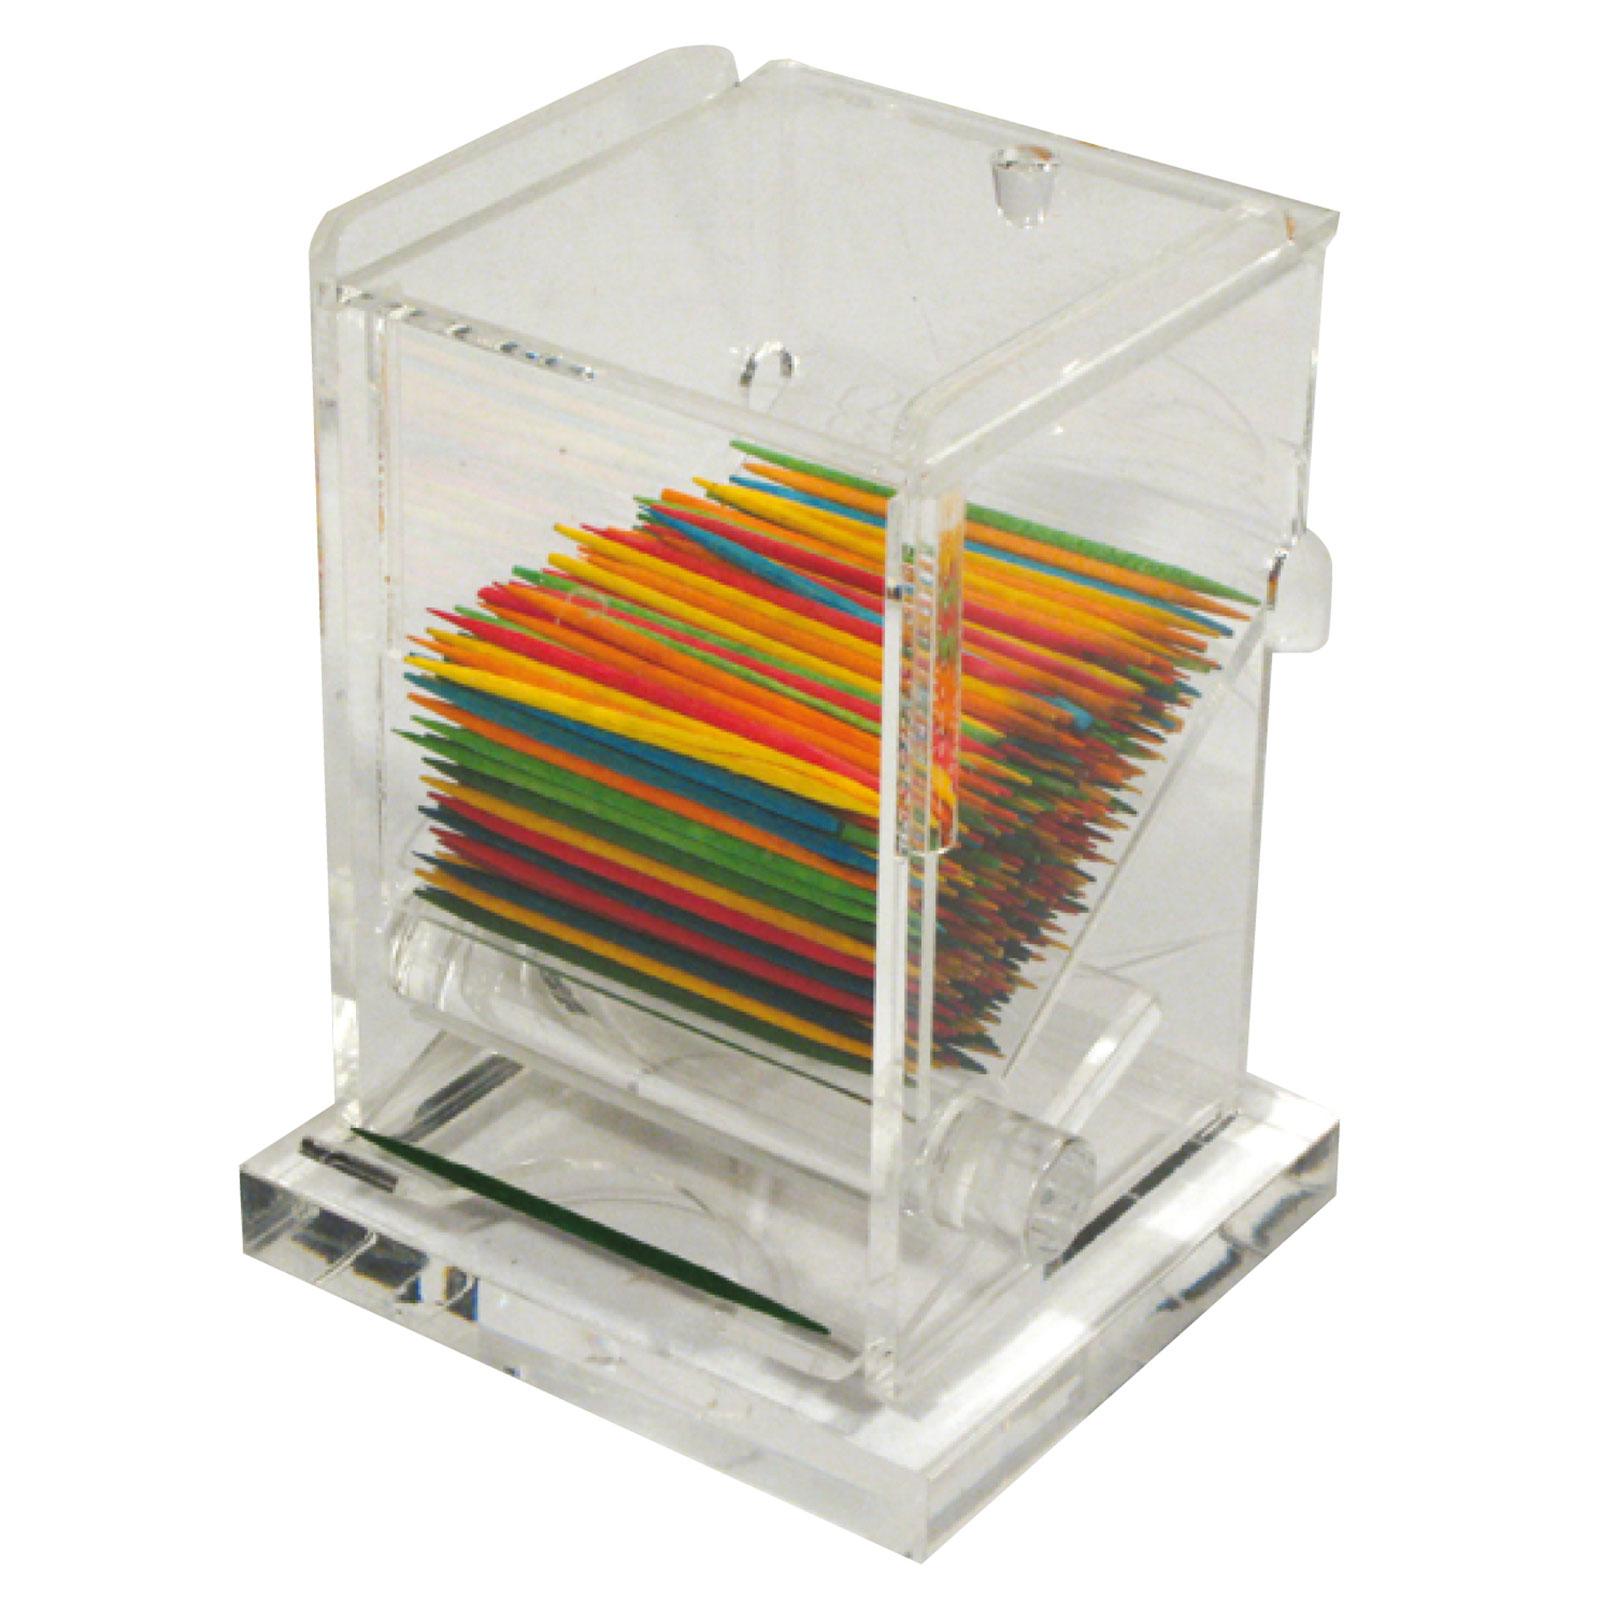 3900-112 Winco ACTD-3 toothpick holder / dispenser